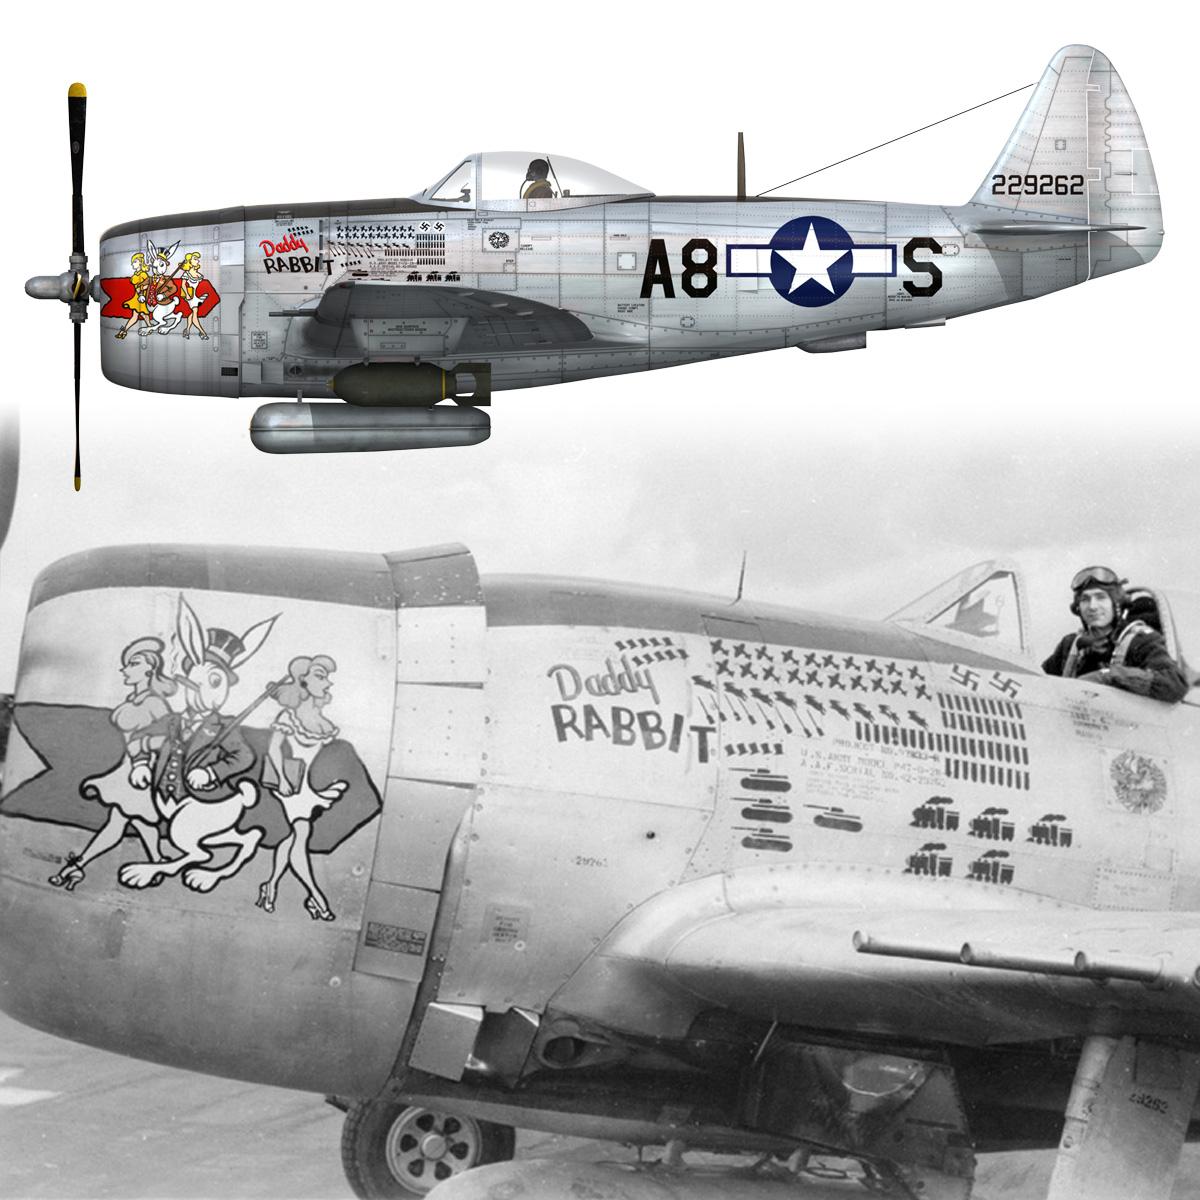 republic p-47 thunderbolt – daddy rabbit 3d model fbx c4d lwo obj 272706